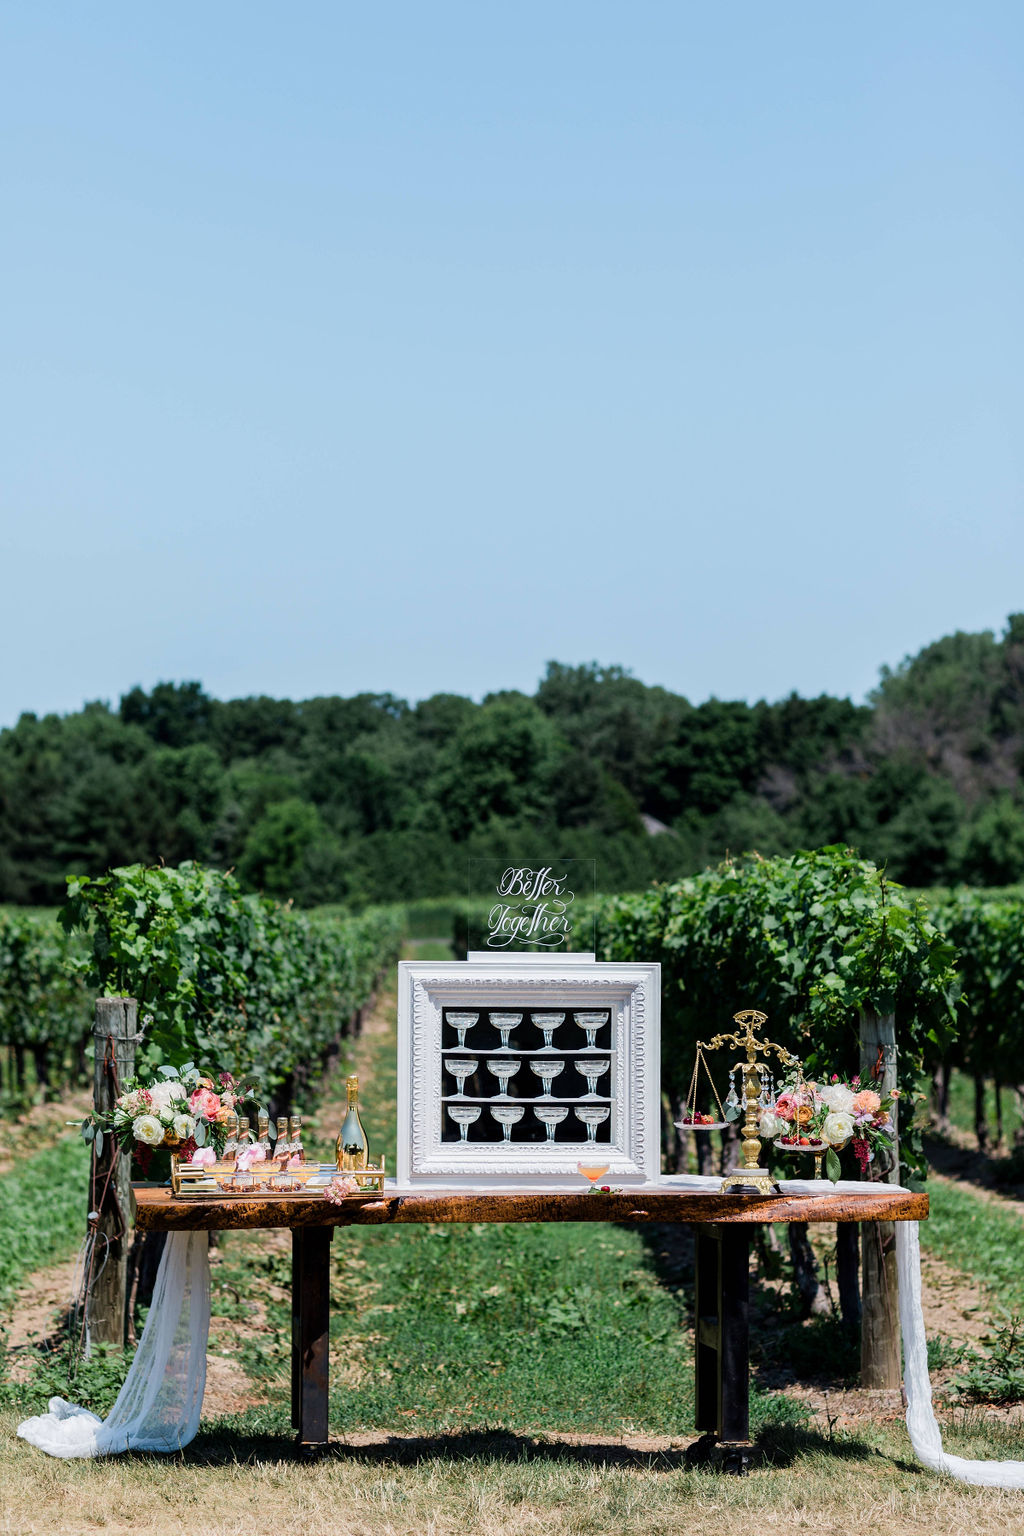 Kurtz-Orchards-Niagara-on-the-Lake-Styled-Wedding-Session-Shotlife-Studio-Calderone-Co-Luxury-Events-Vineyard-Bride-22.JPG